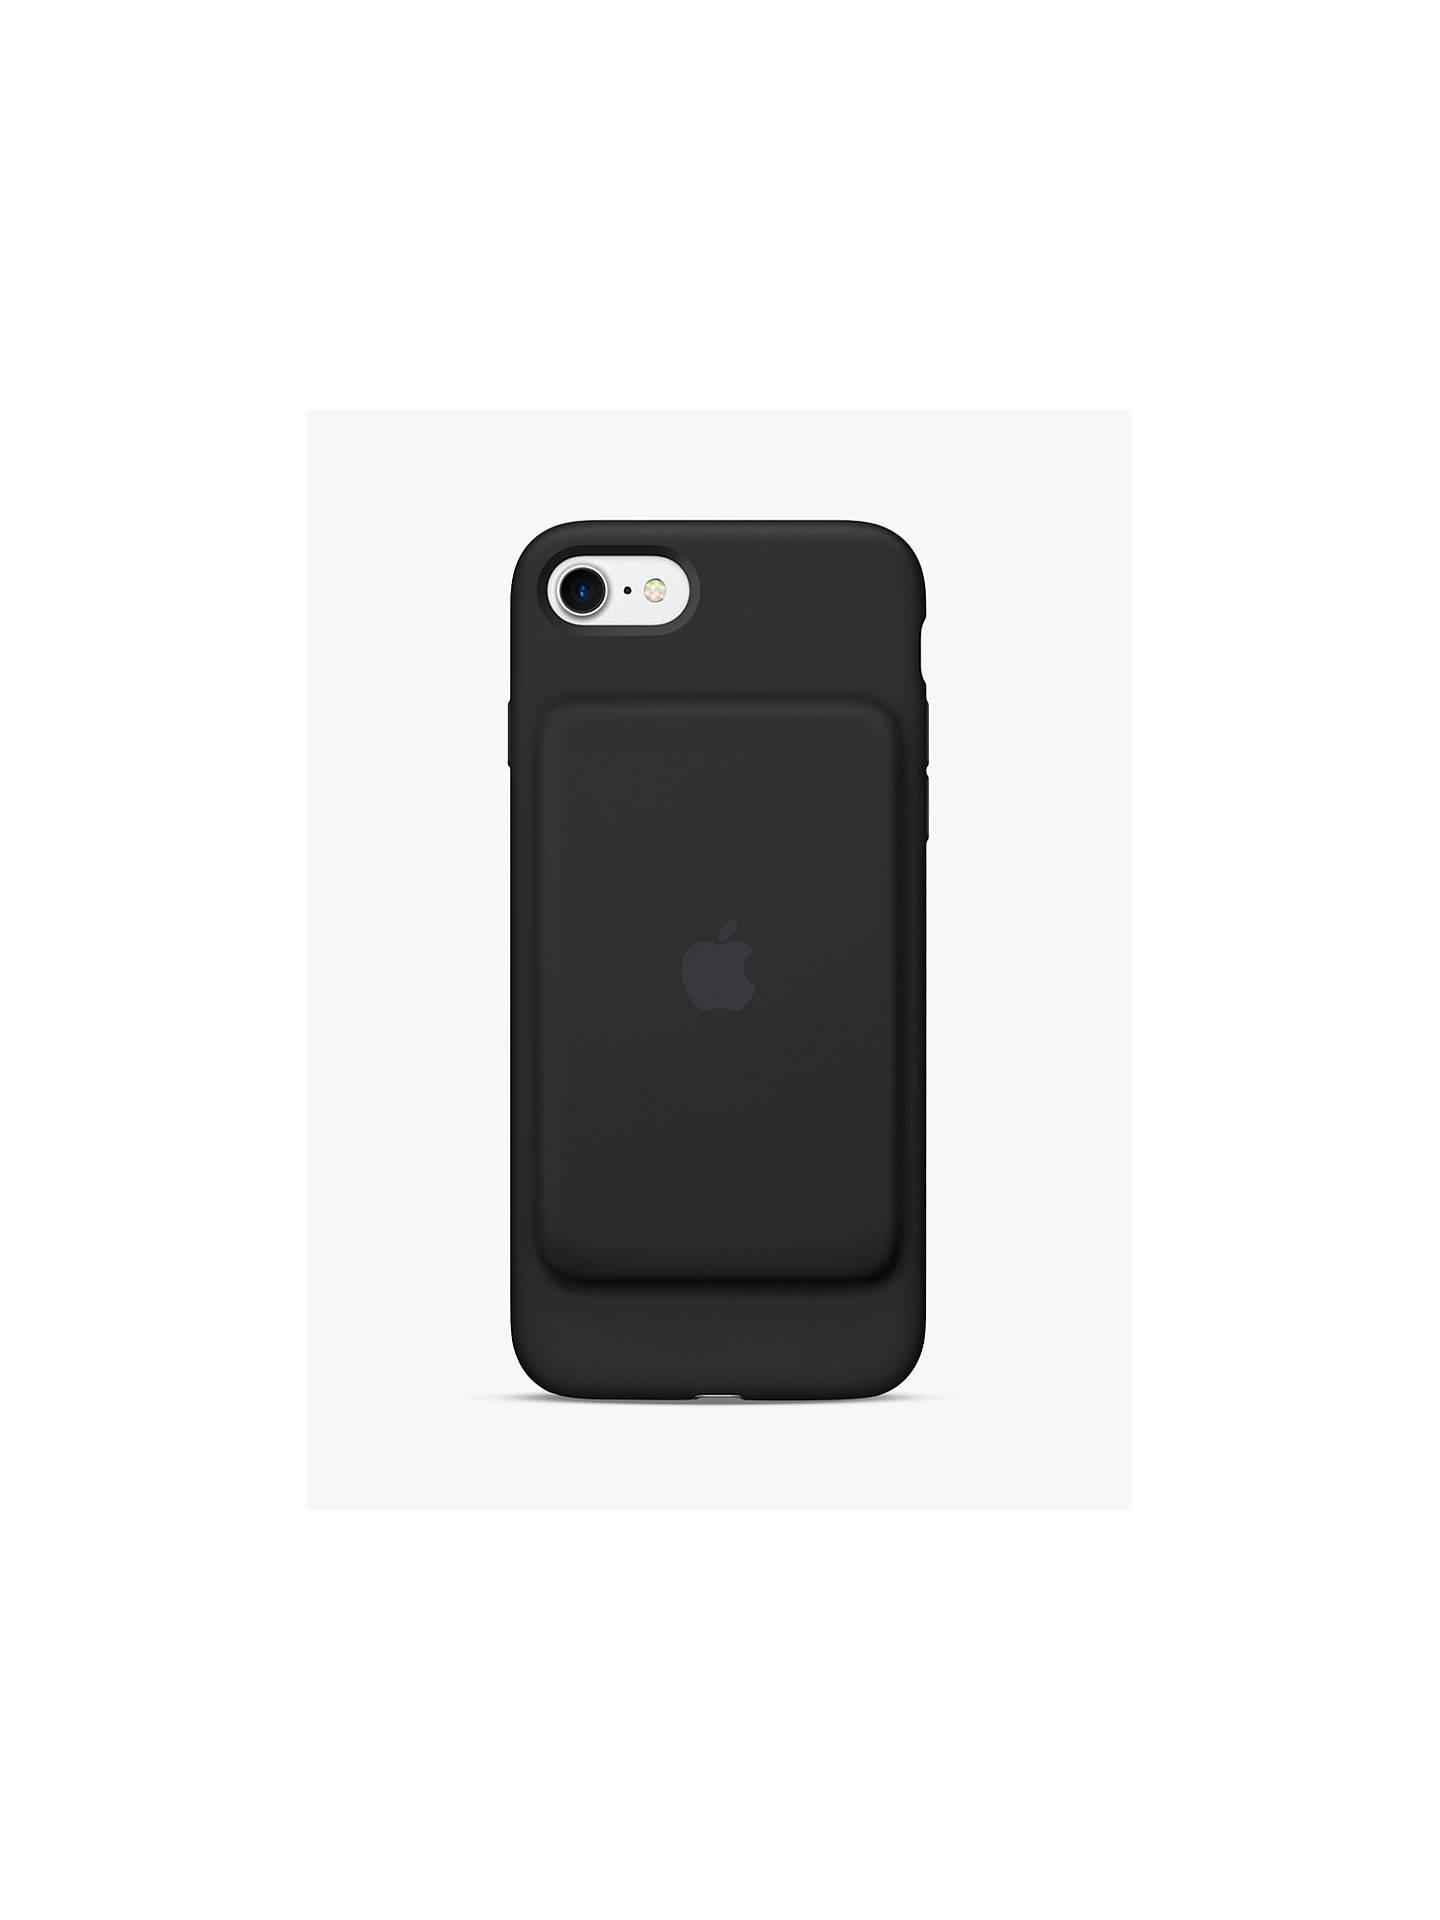 official photos 73e85 66375 Apple Smart Battery Case for iPhone 7, Black